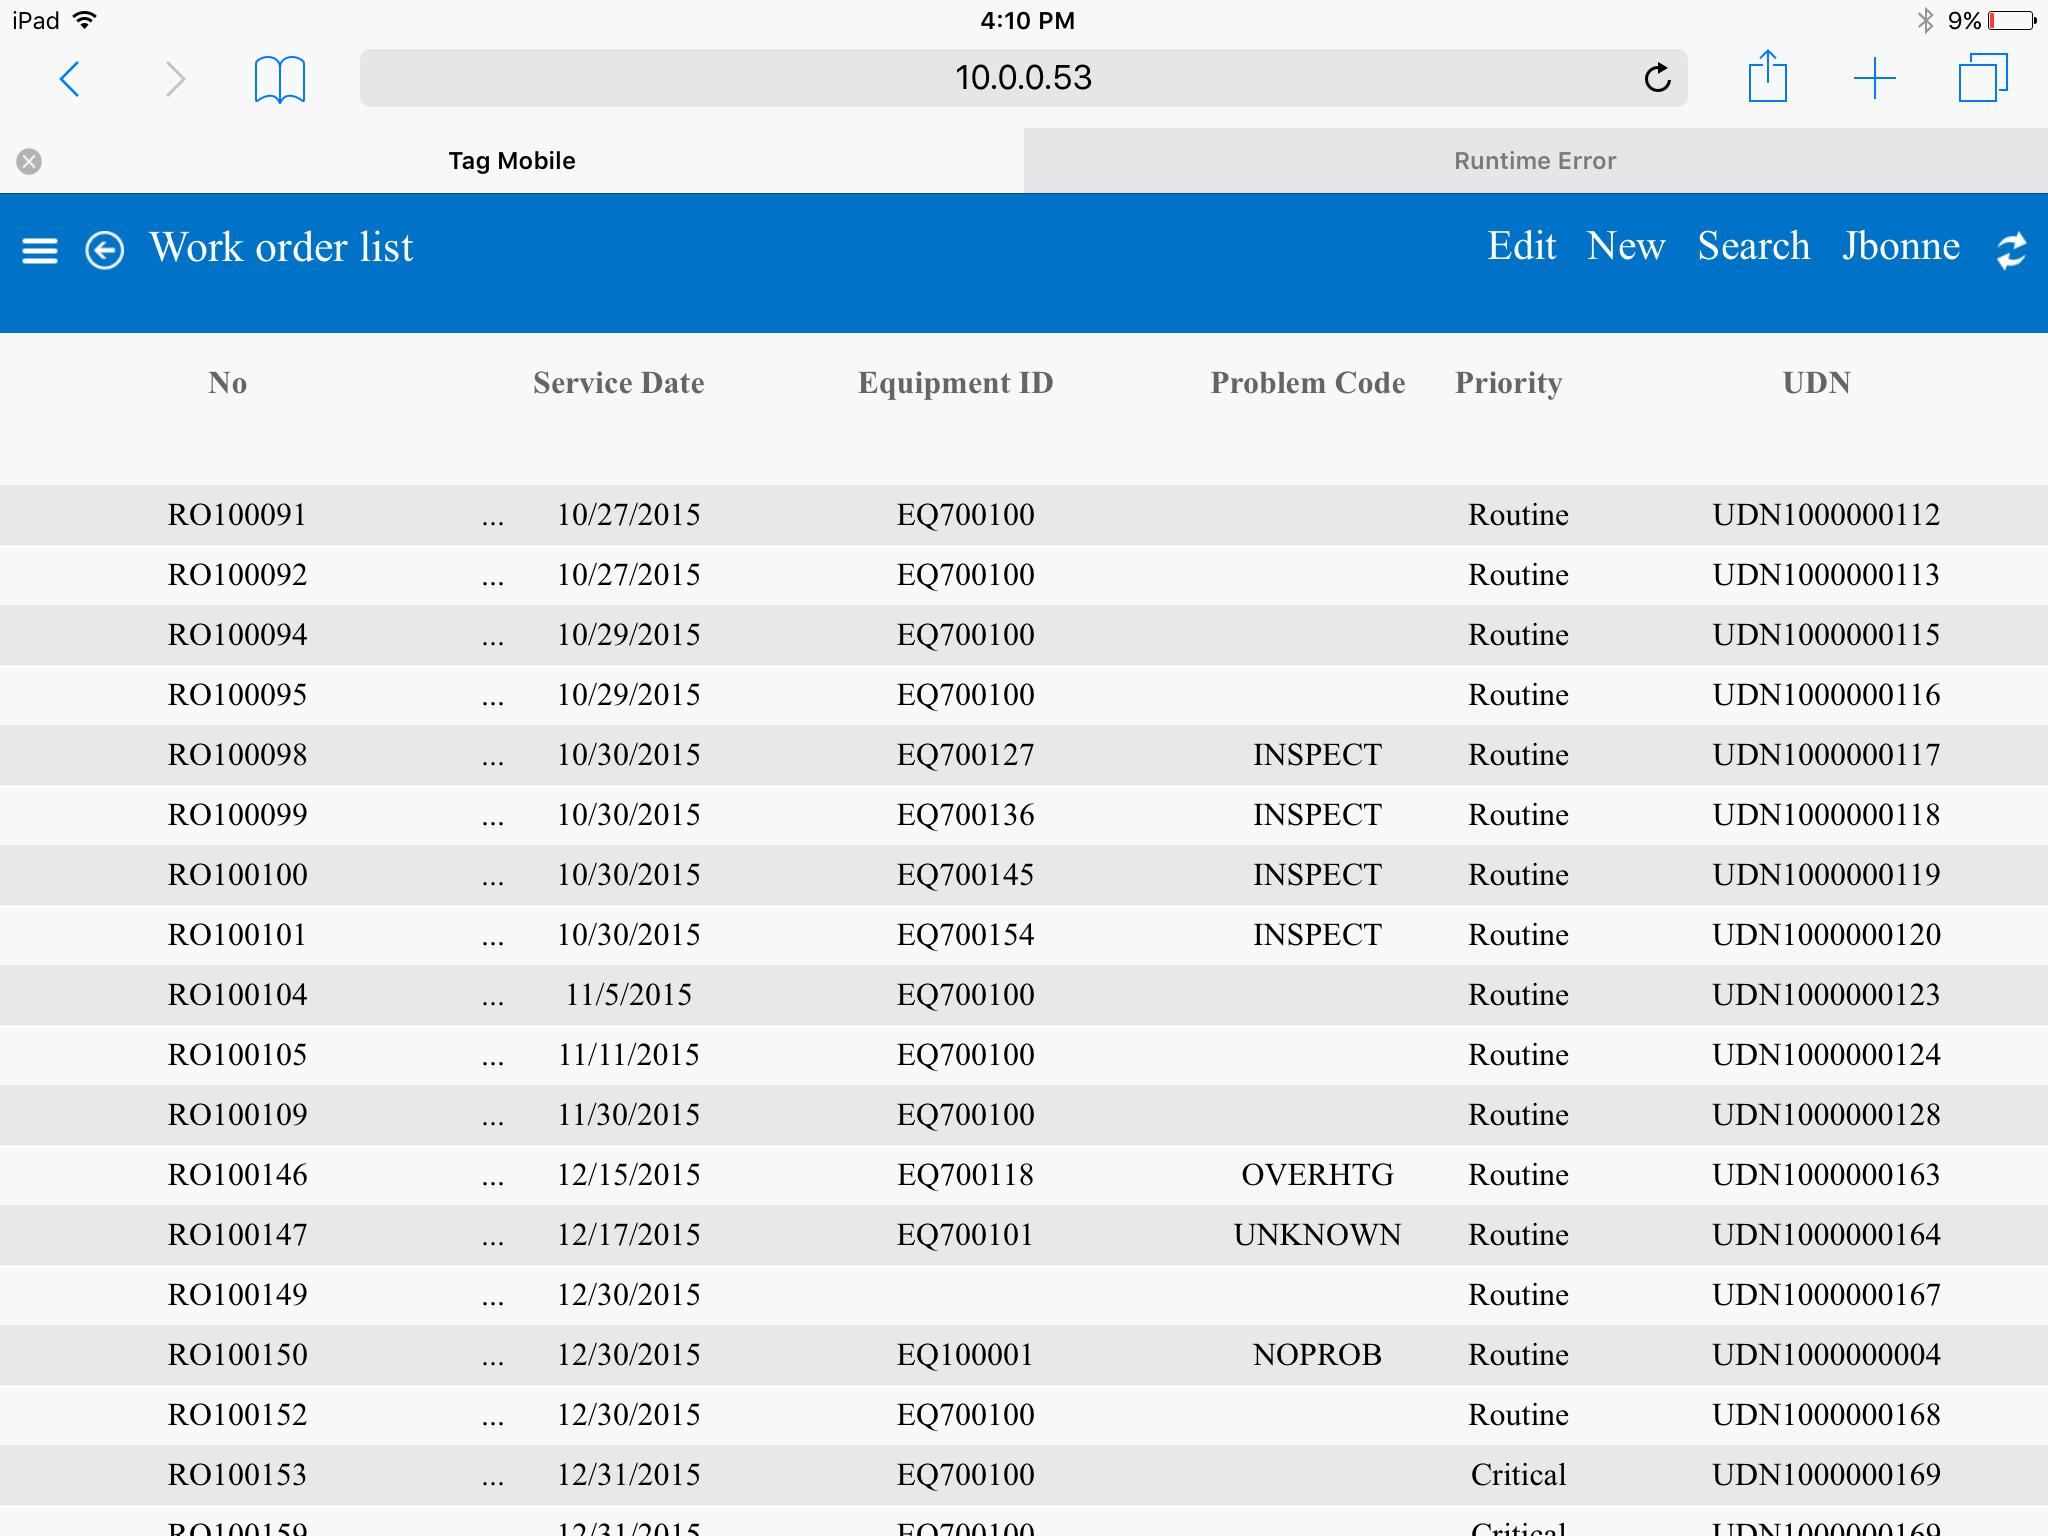 Work order list